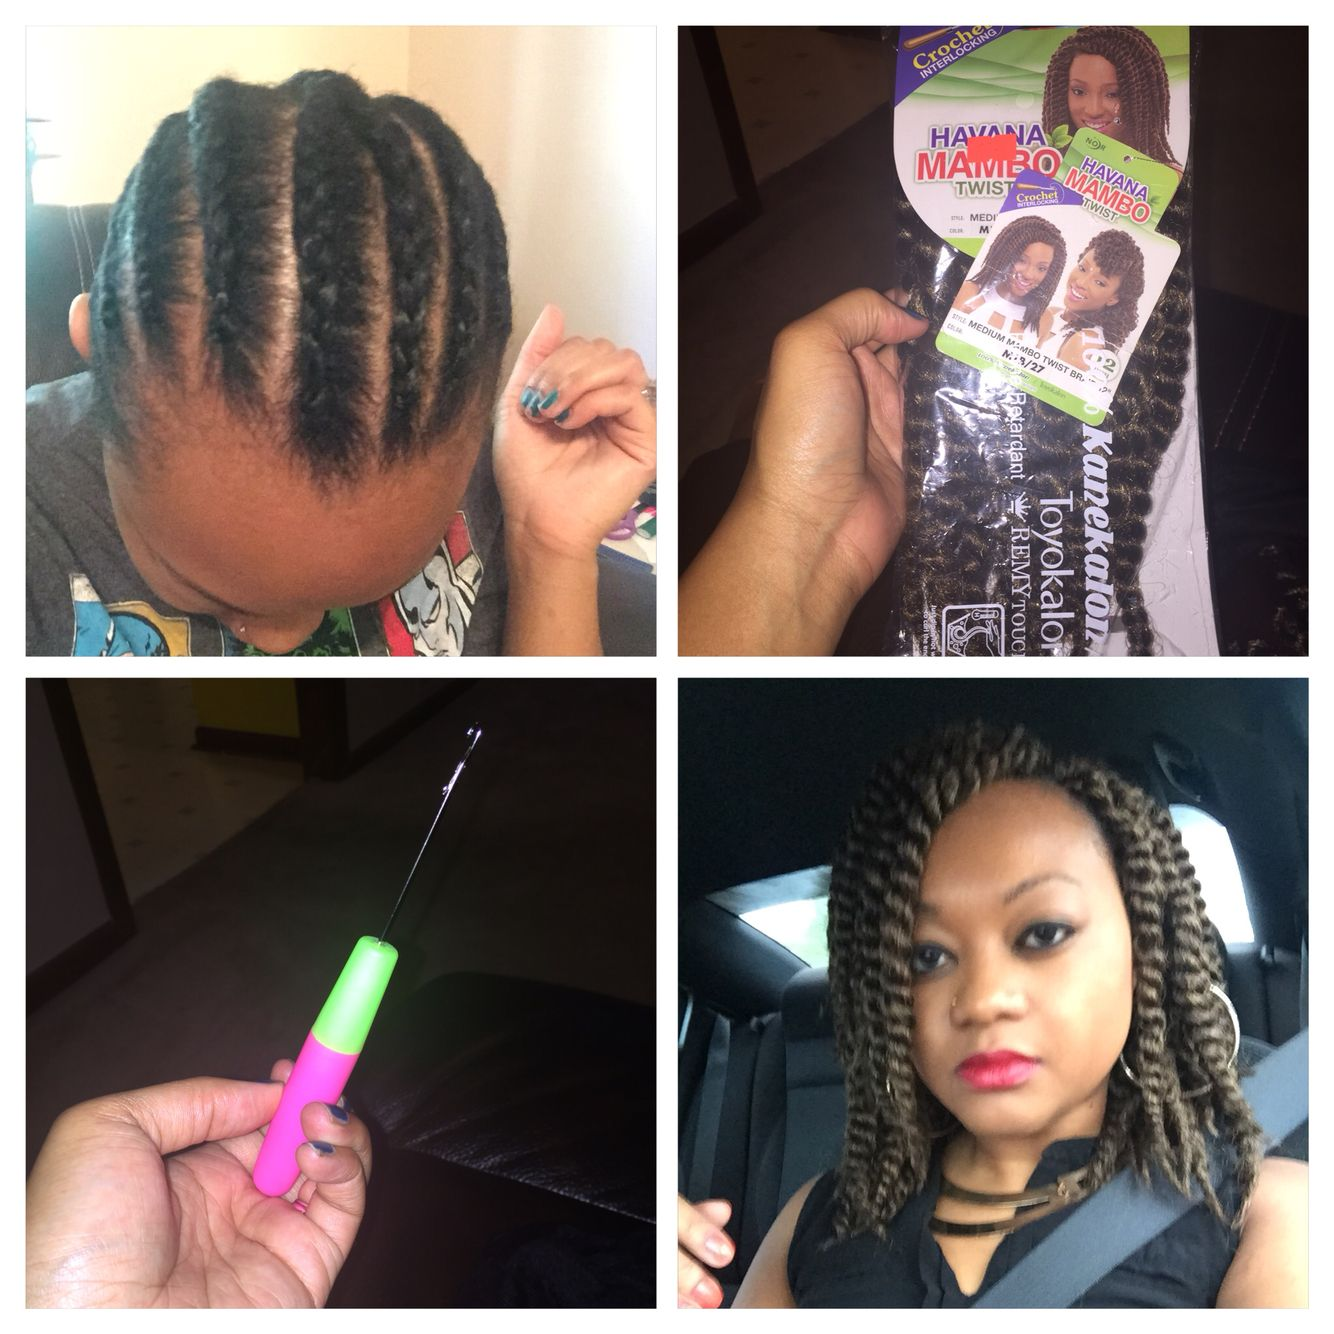 What kind of hair do you use for crochet braids - Crochet Braids Havana Twist Hair 12 Inch